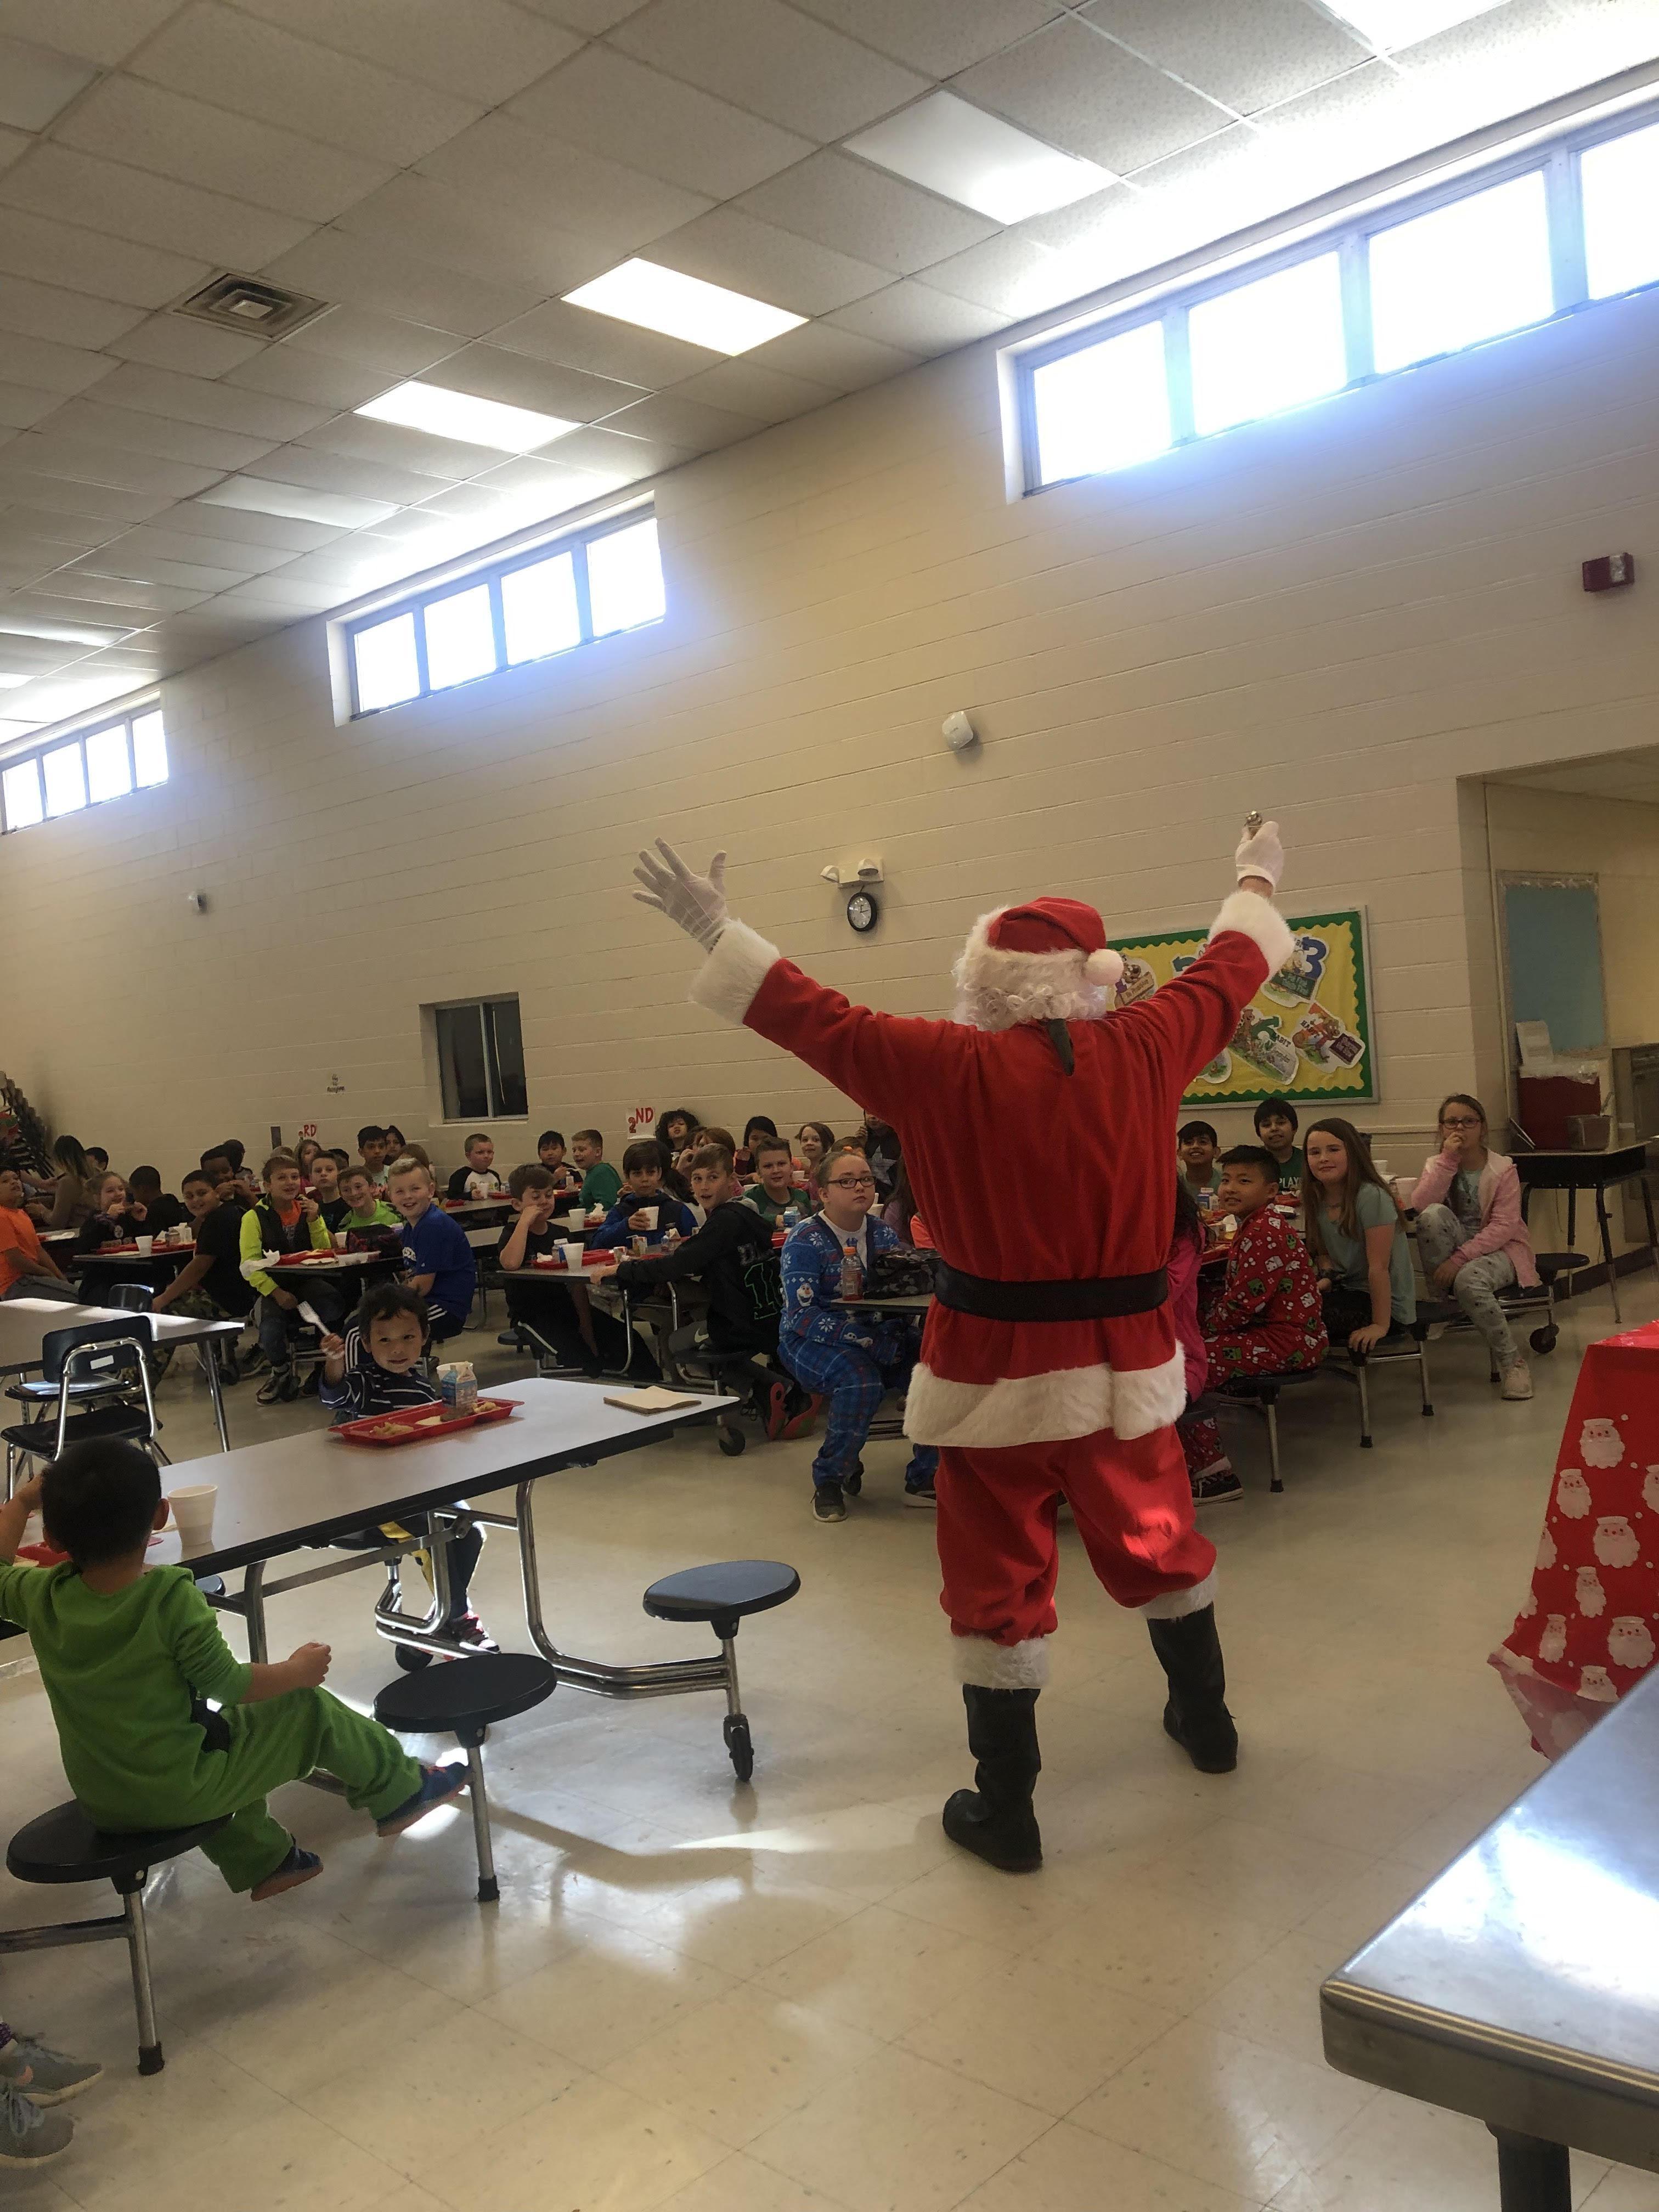 Santa says Ho, Ho, Ho!